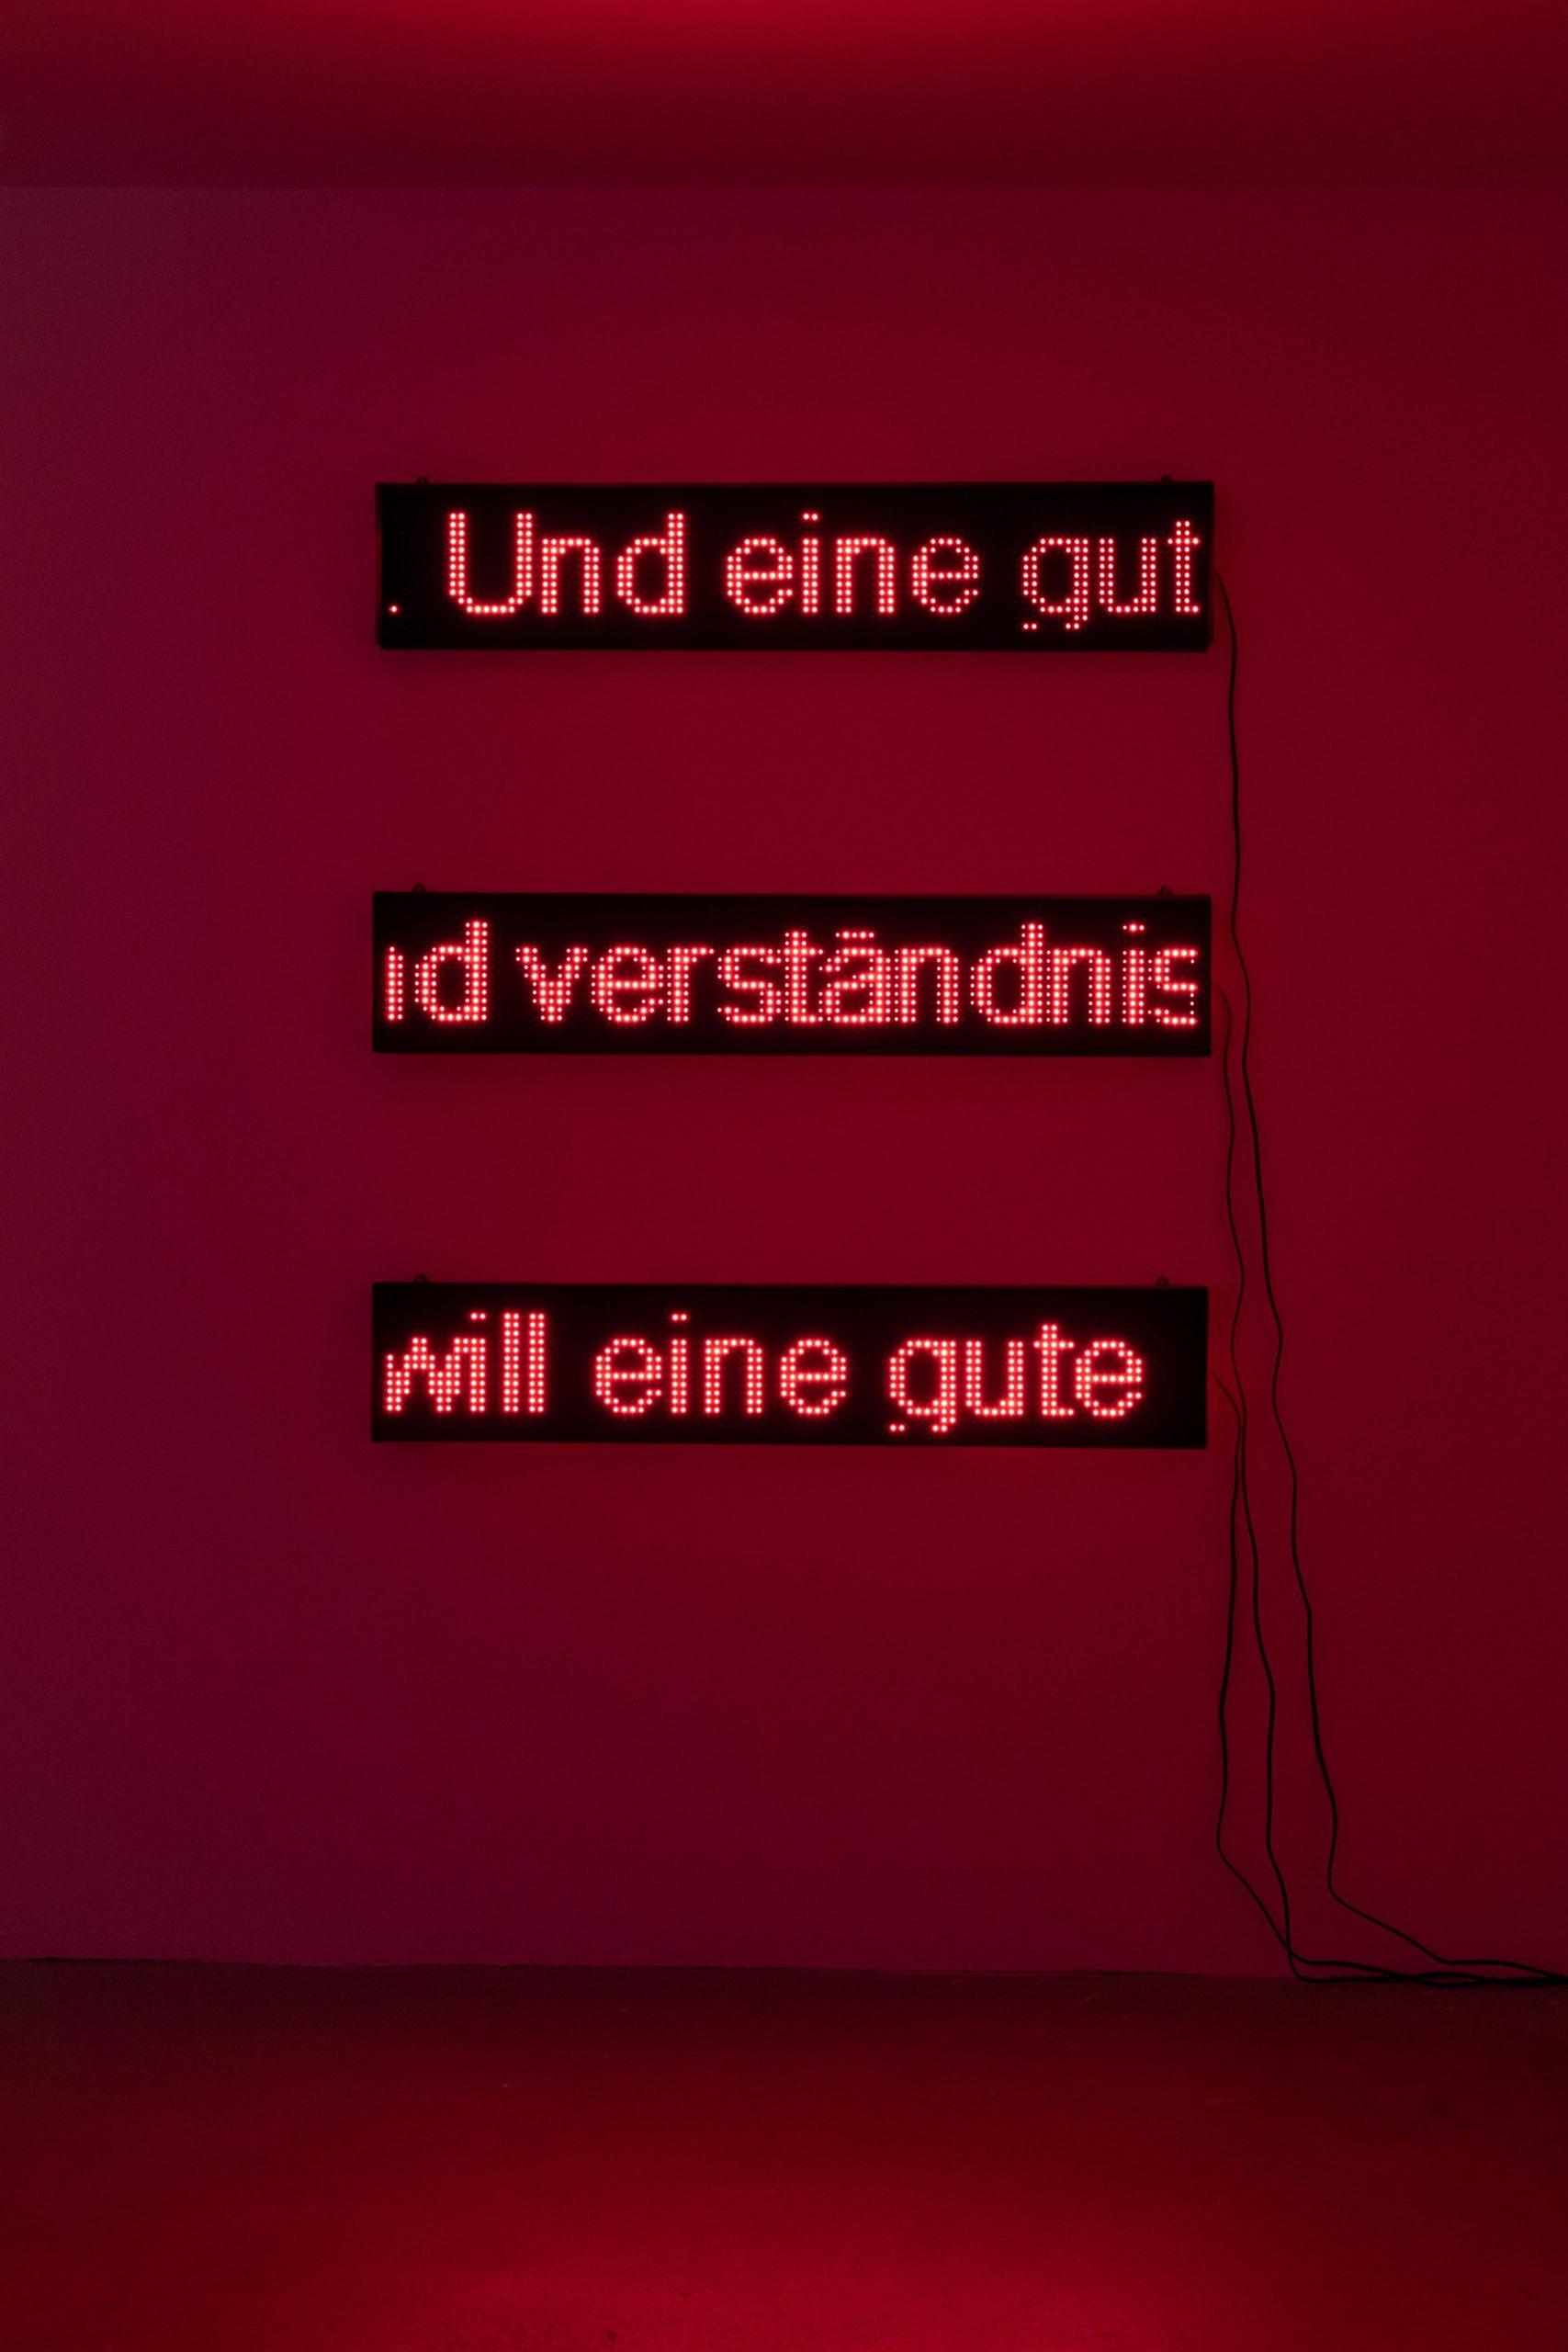 """Ongoing Manifesto"", Kunsthalle Luzern, 2020"